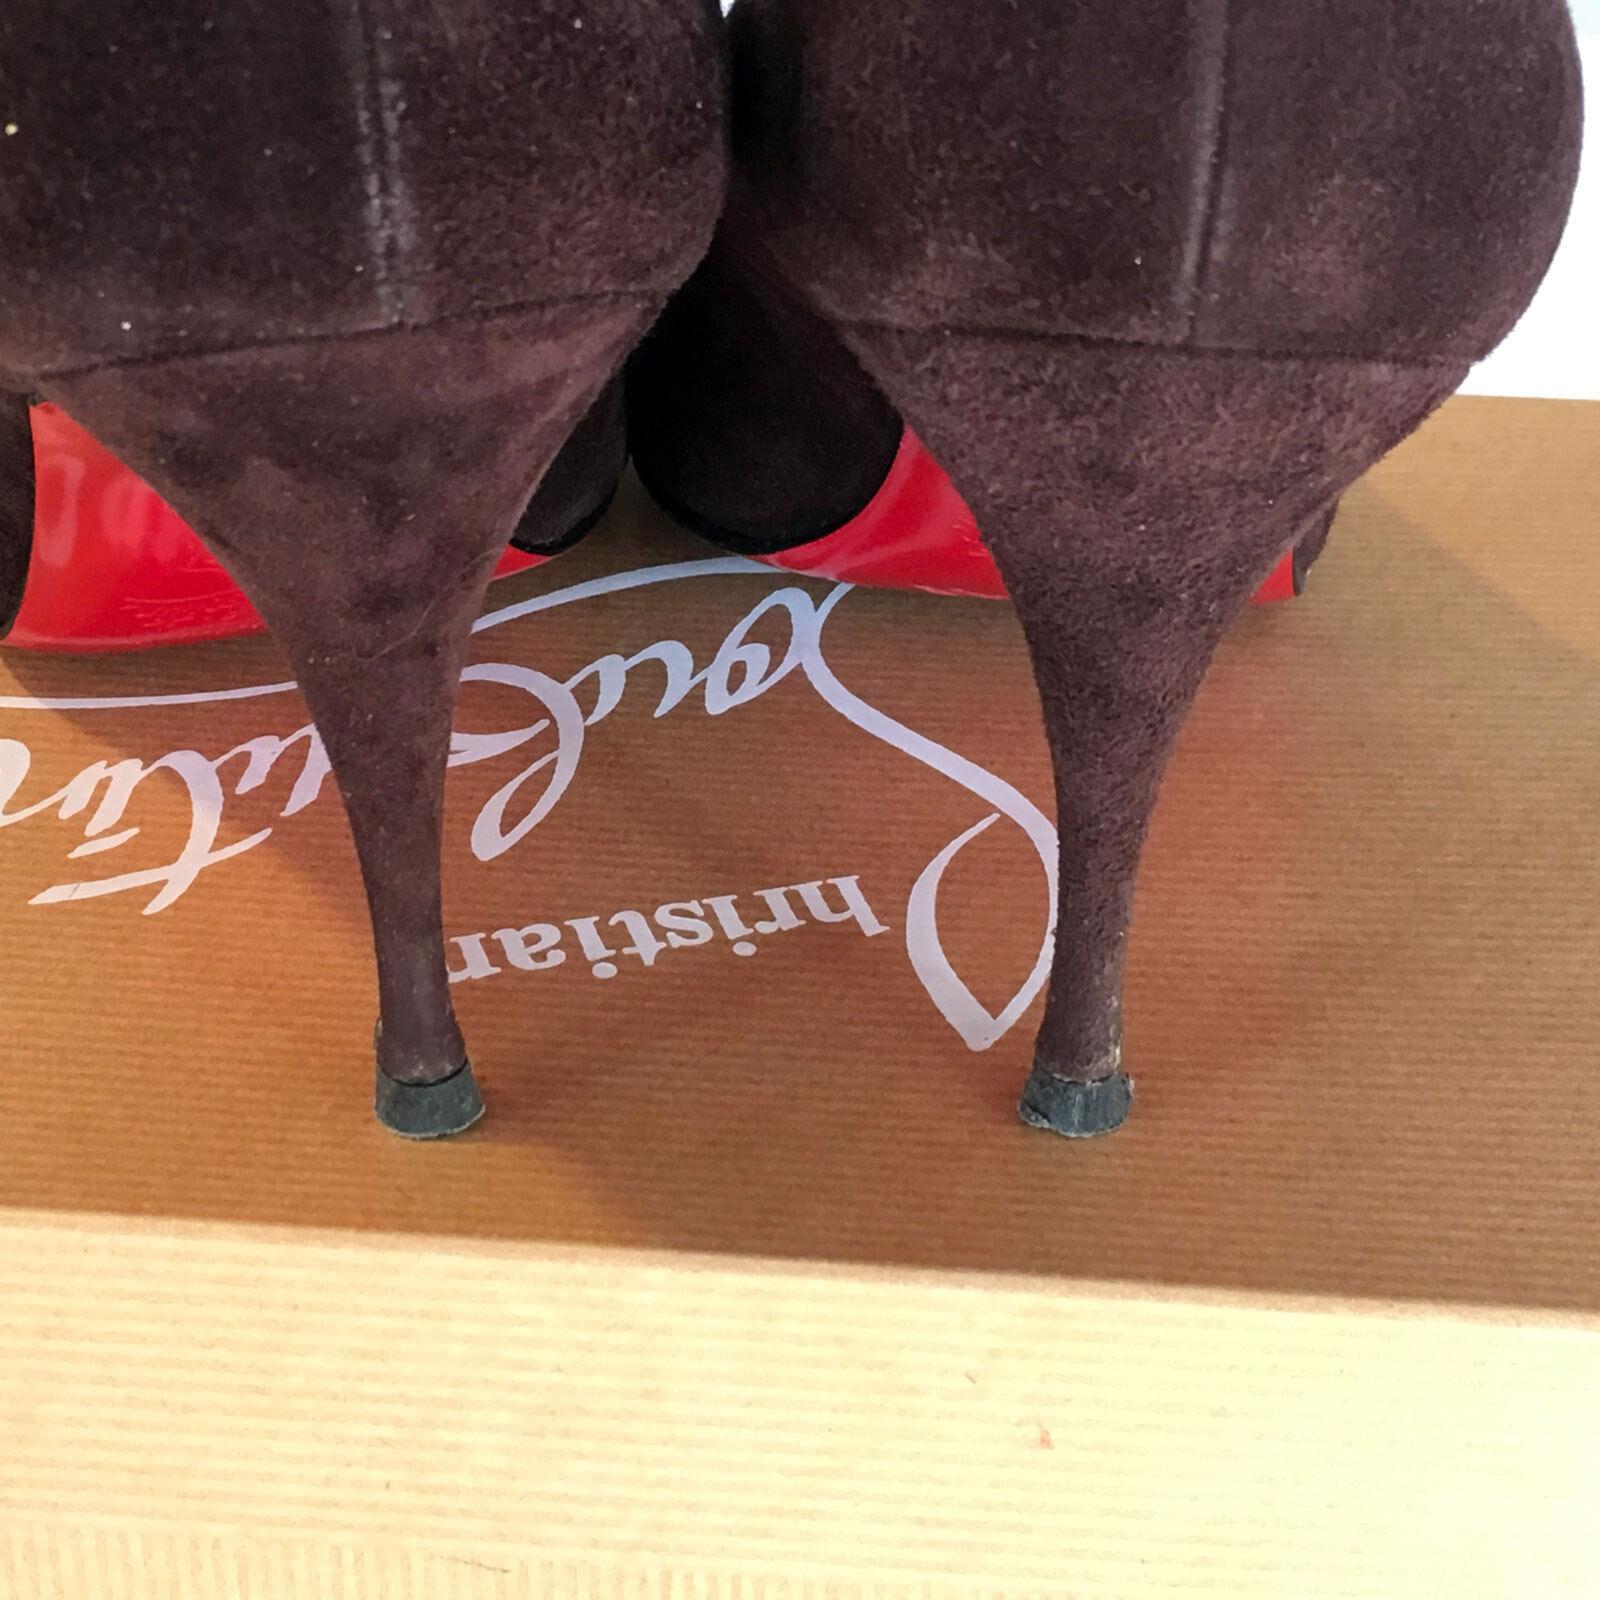 Christian Christian Christian Louboutin   Yoyo 85 Peep Toe Pumps in braun Suede– Größe 38 B 955c94